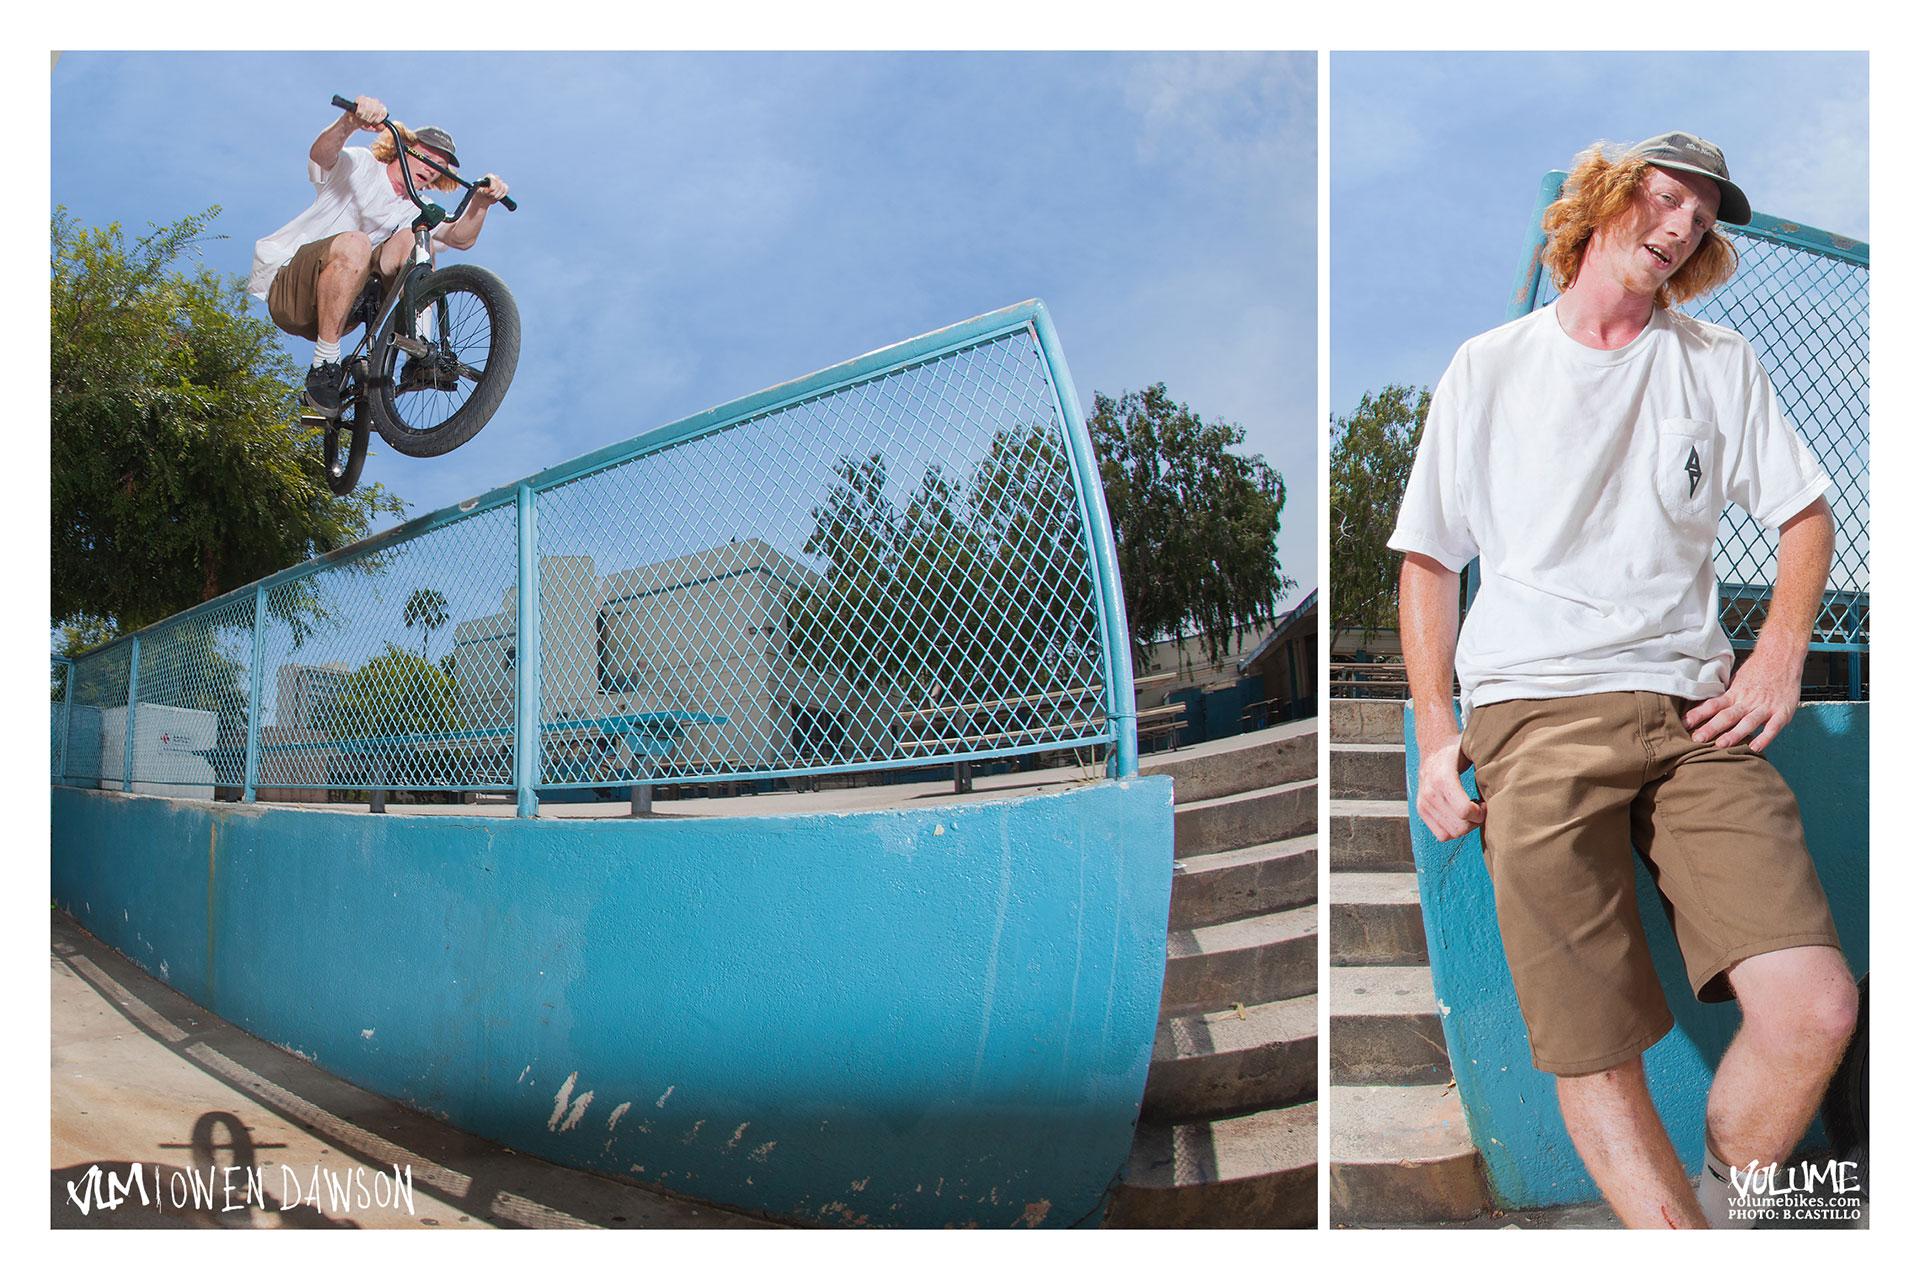 Owen Dawson: Double peg to hop over